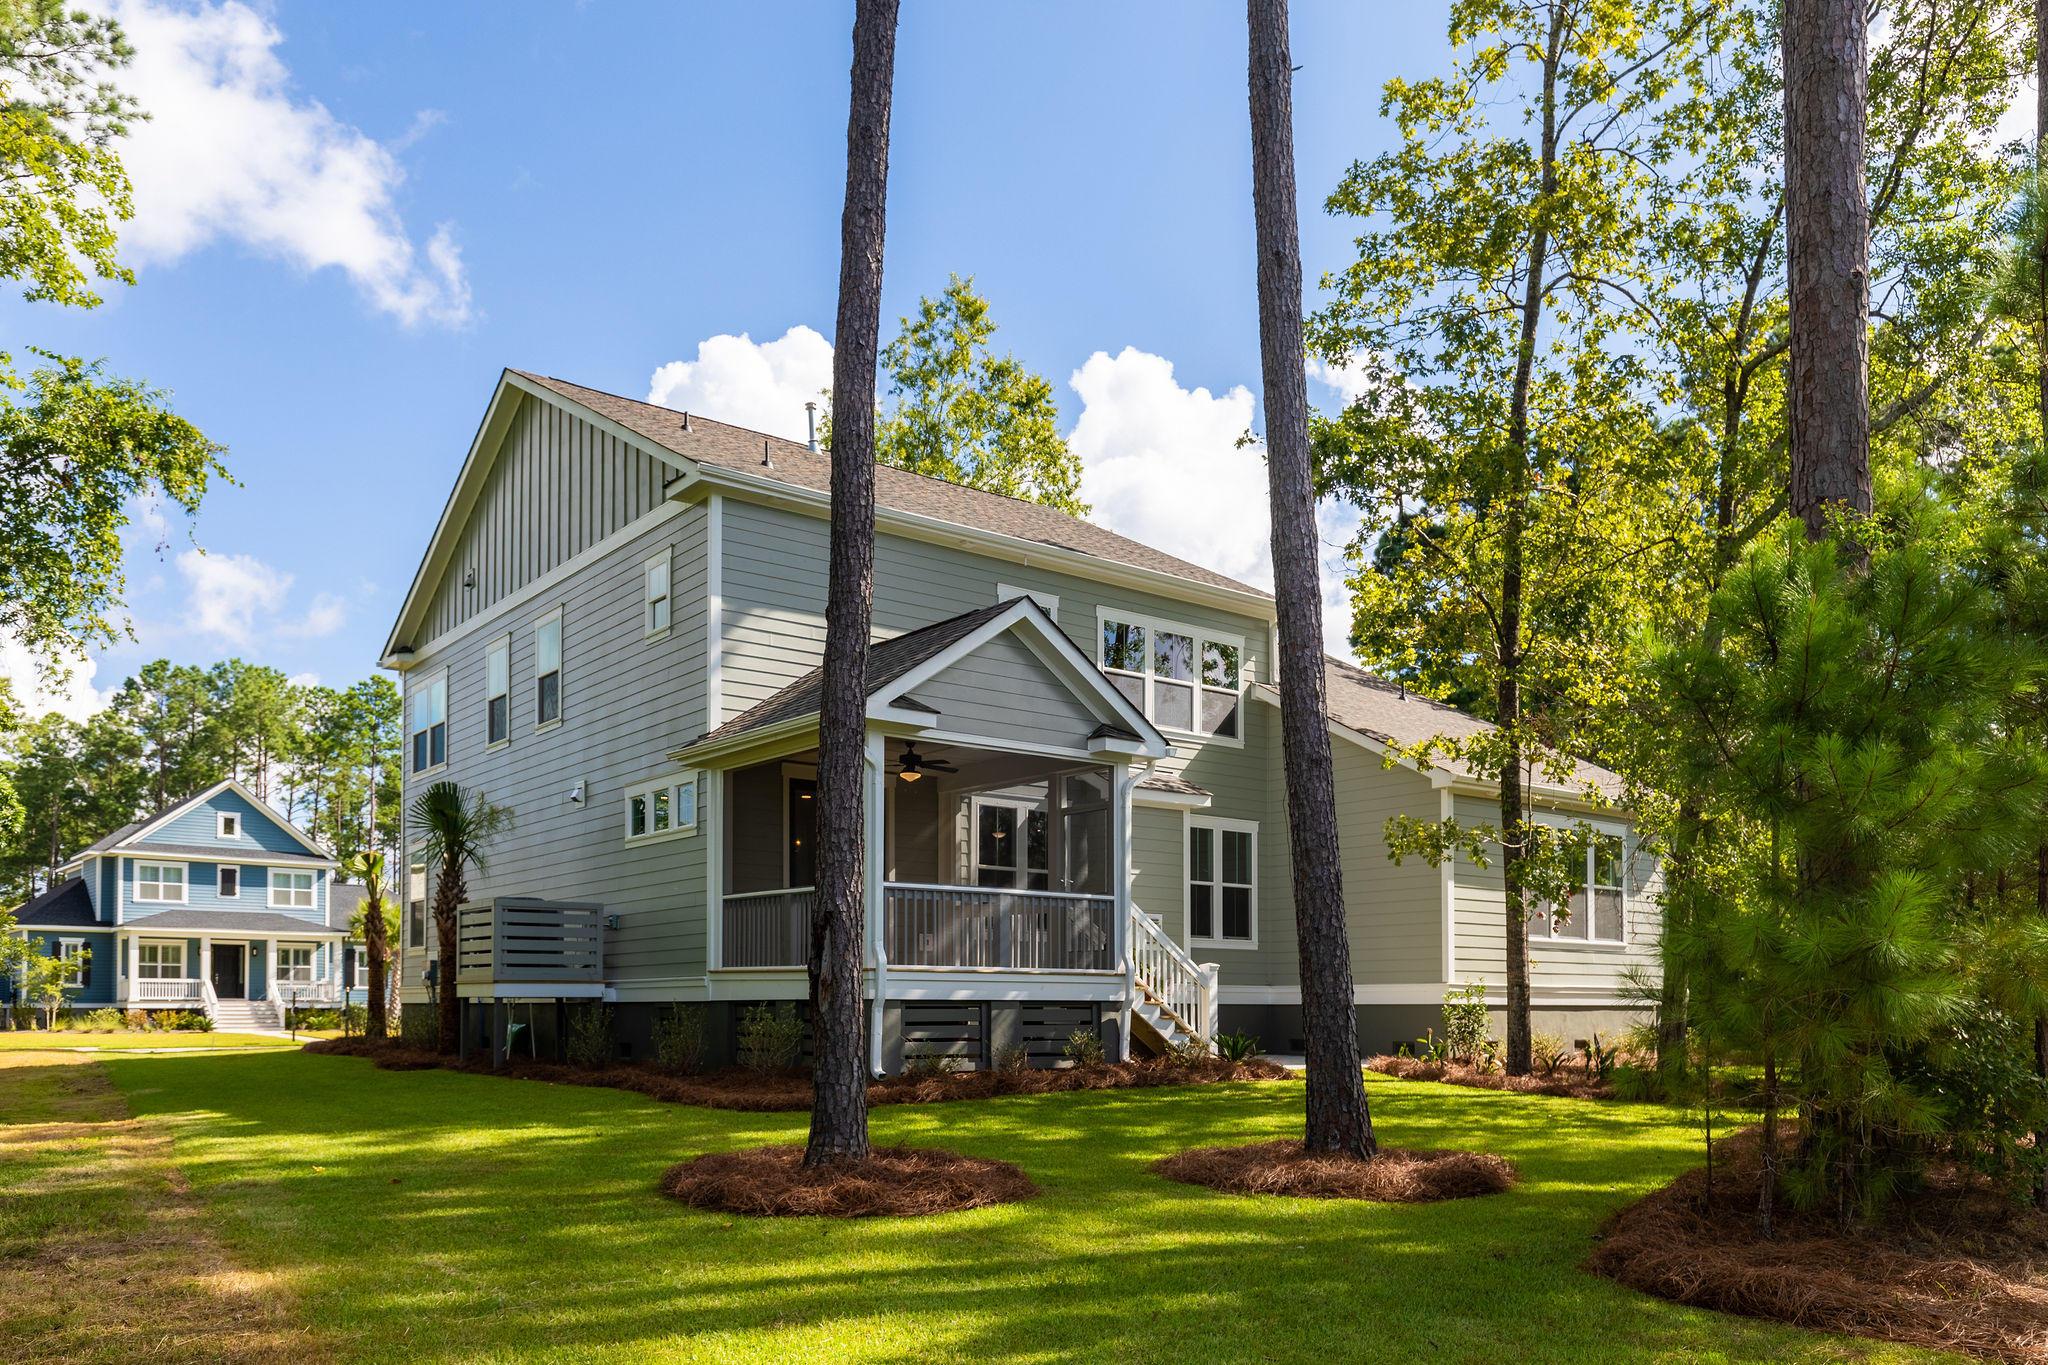 Park West Homes For Sale - 2291 Middlesex, Mount Pleasant, SC - 10